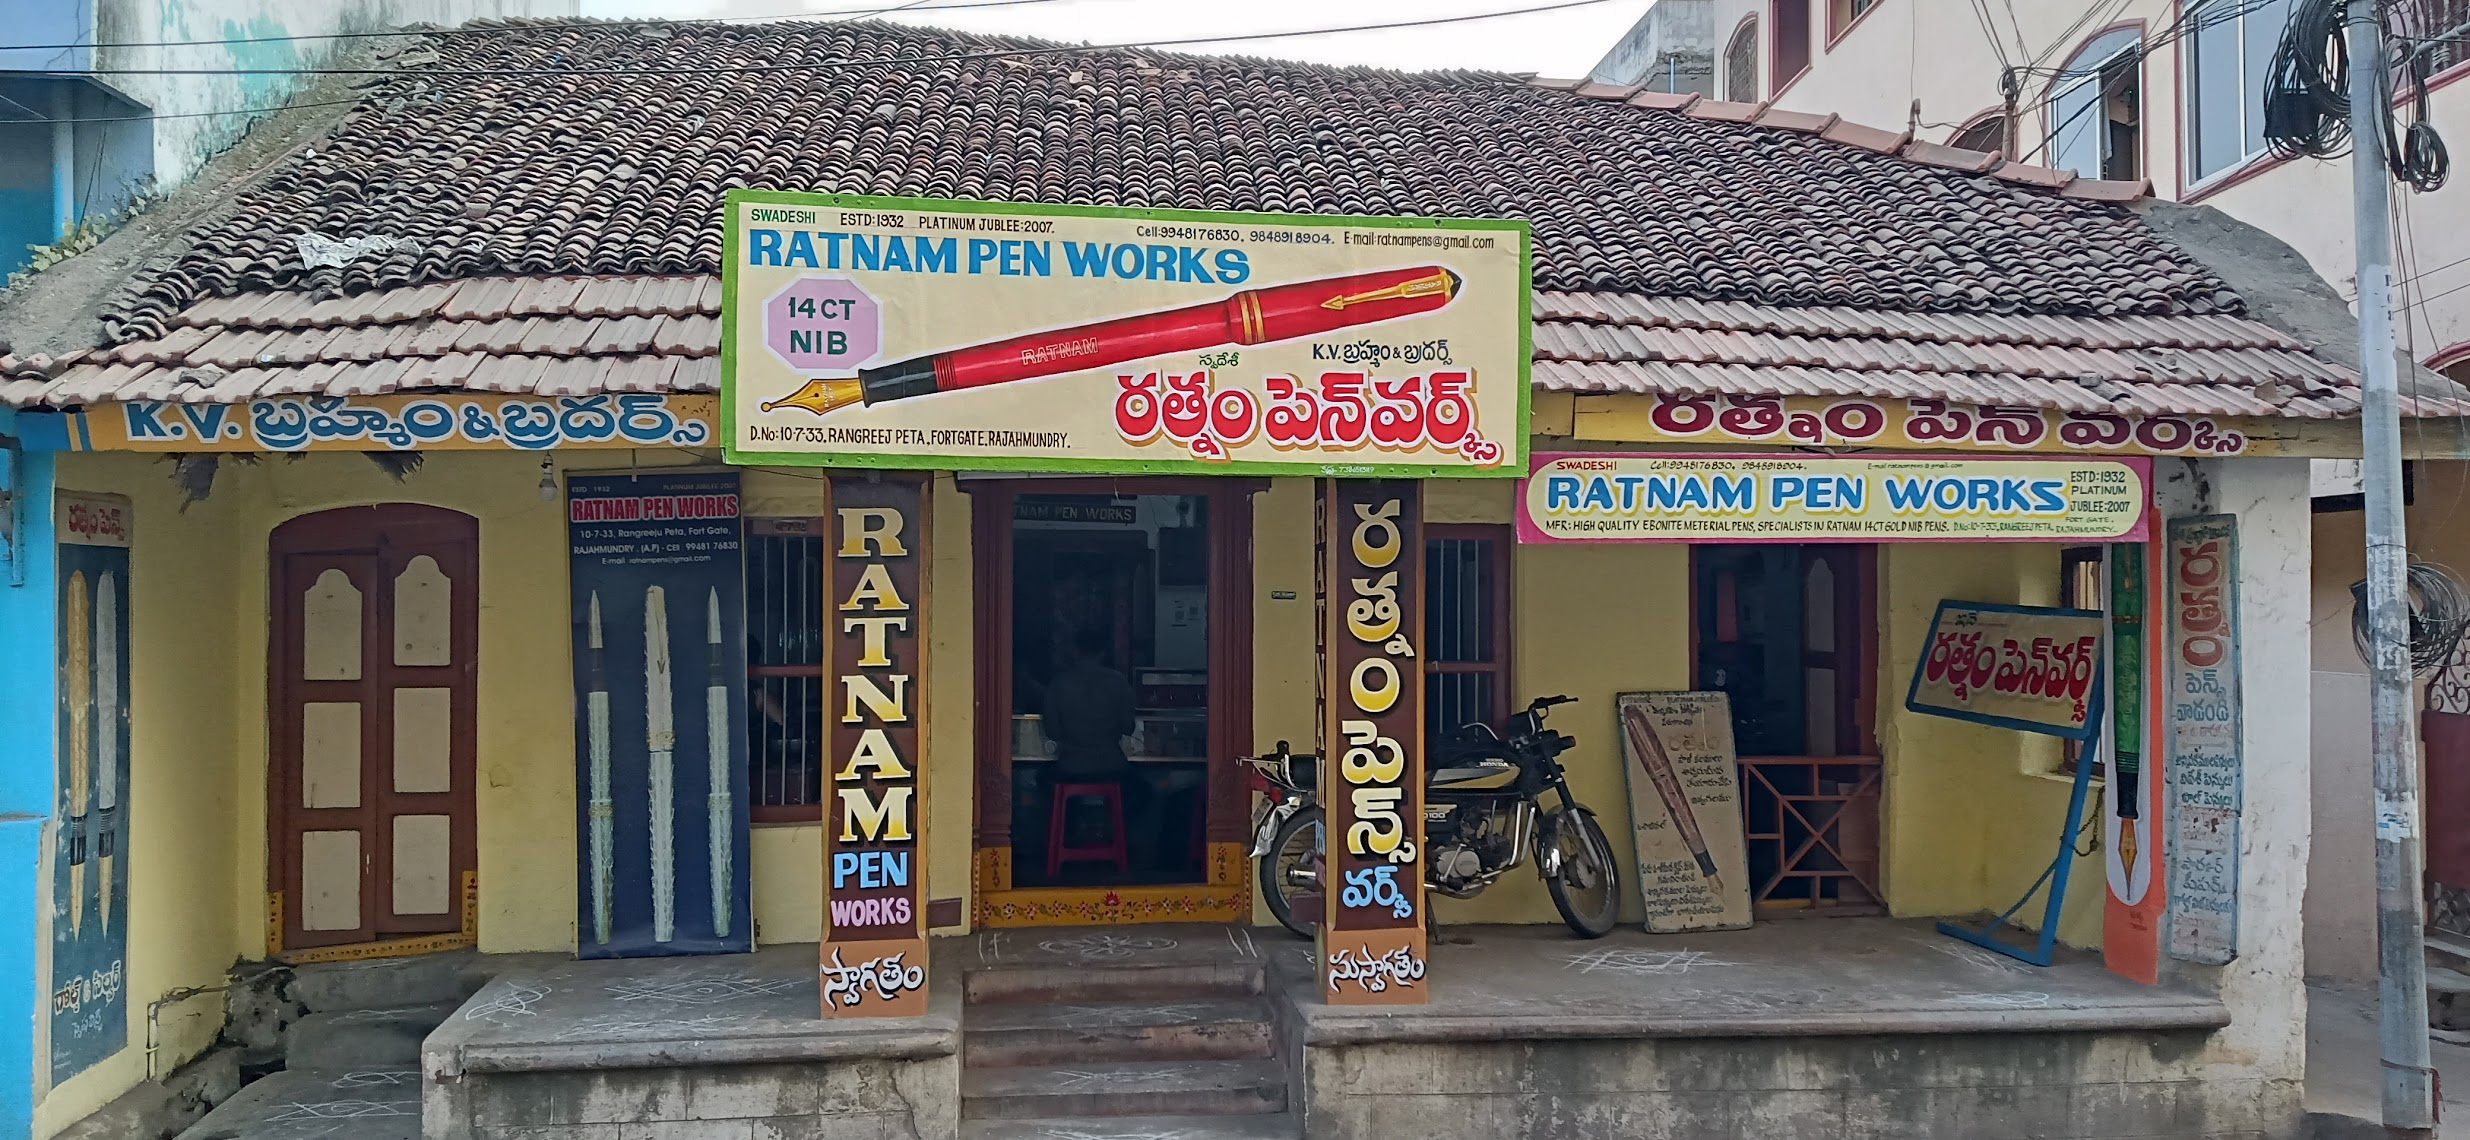 ratnam pens Rajahmundry.